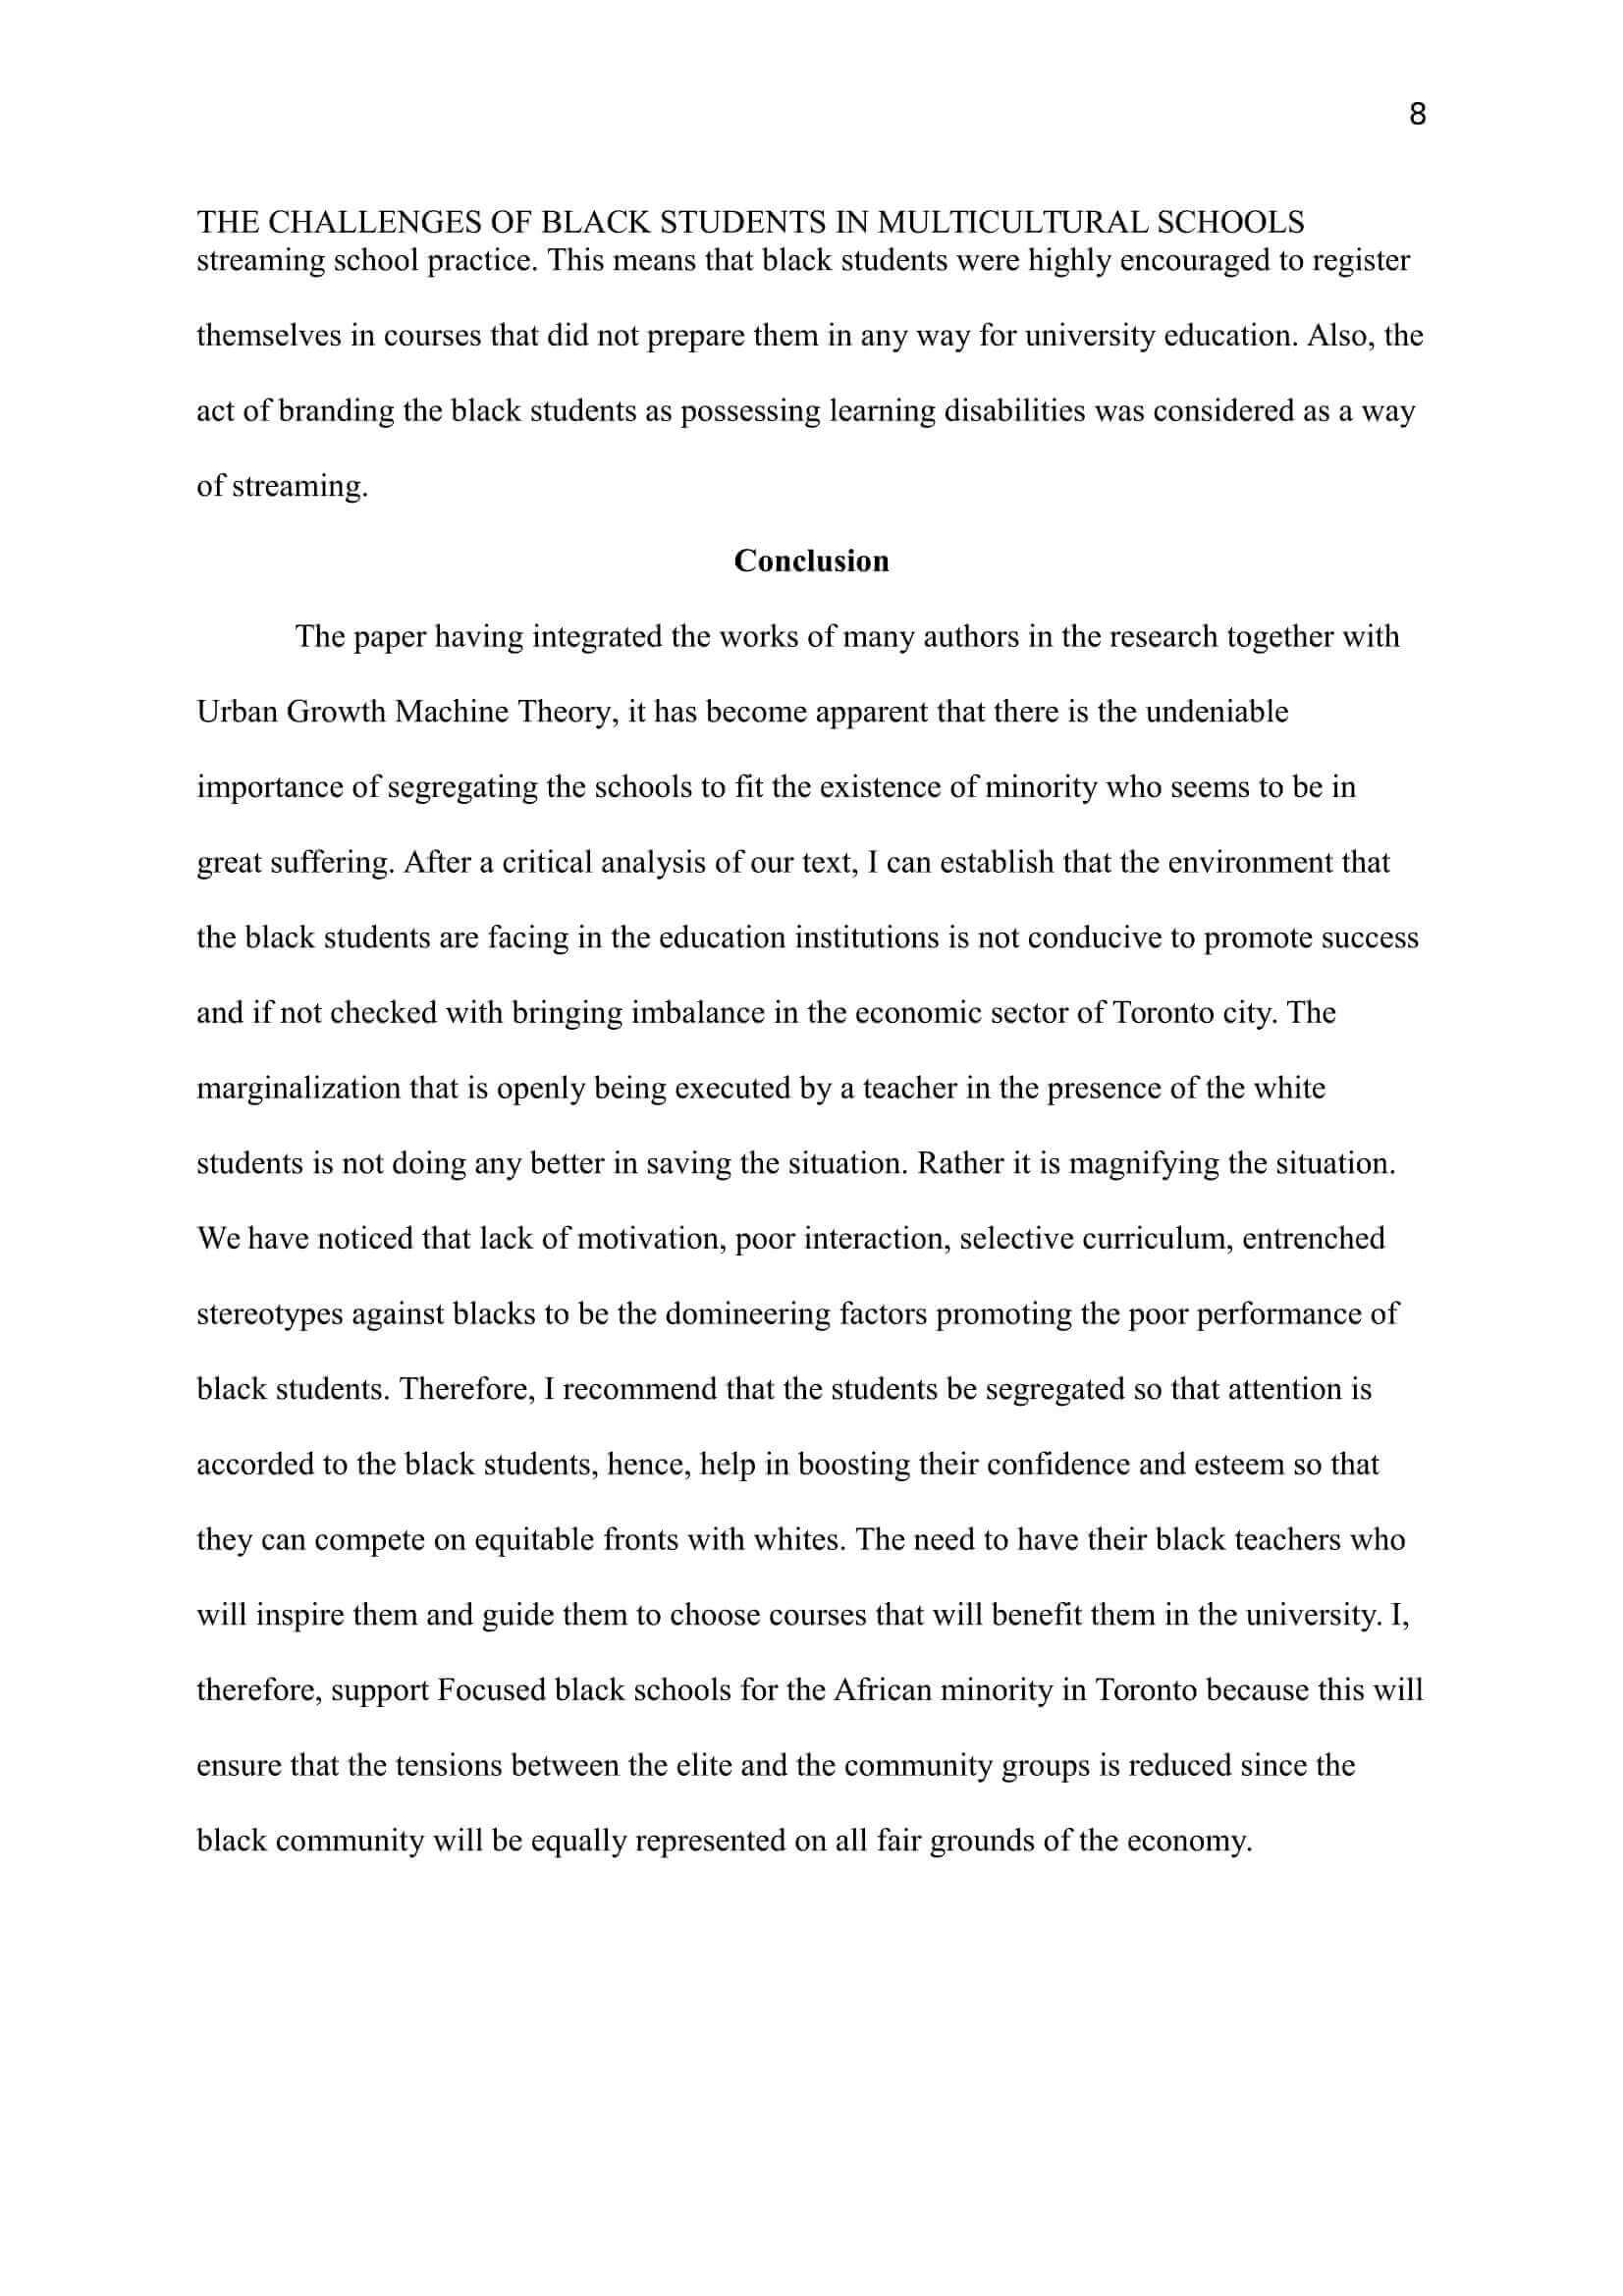 School essay editing services au - proifsacom